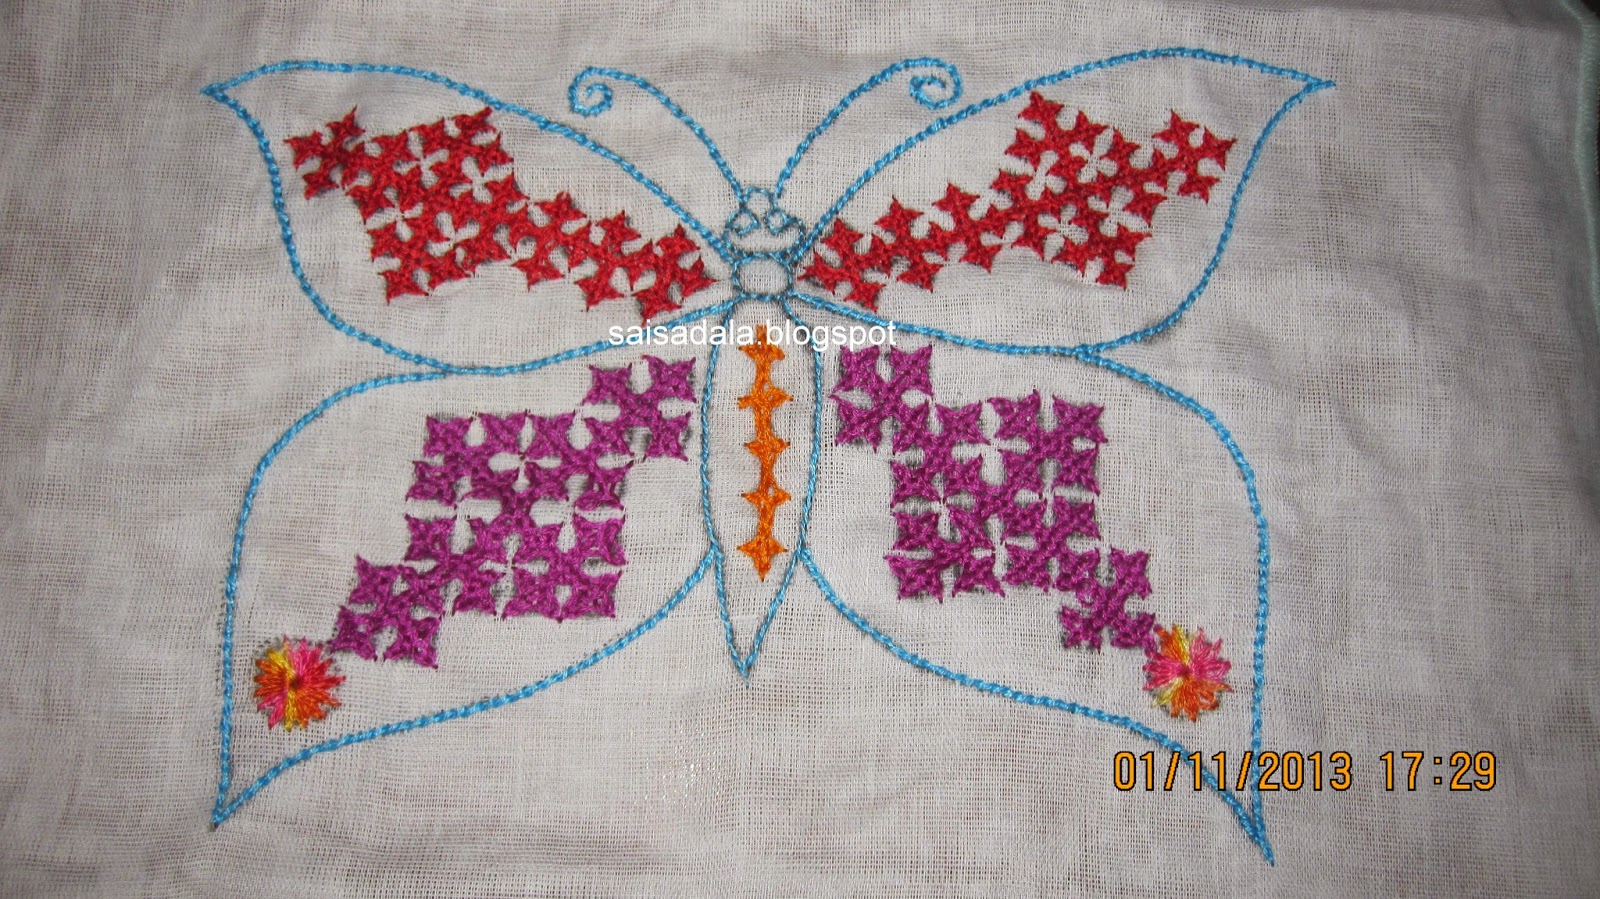 Sadala39s Embroidery Kutch Work